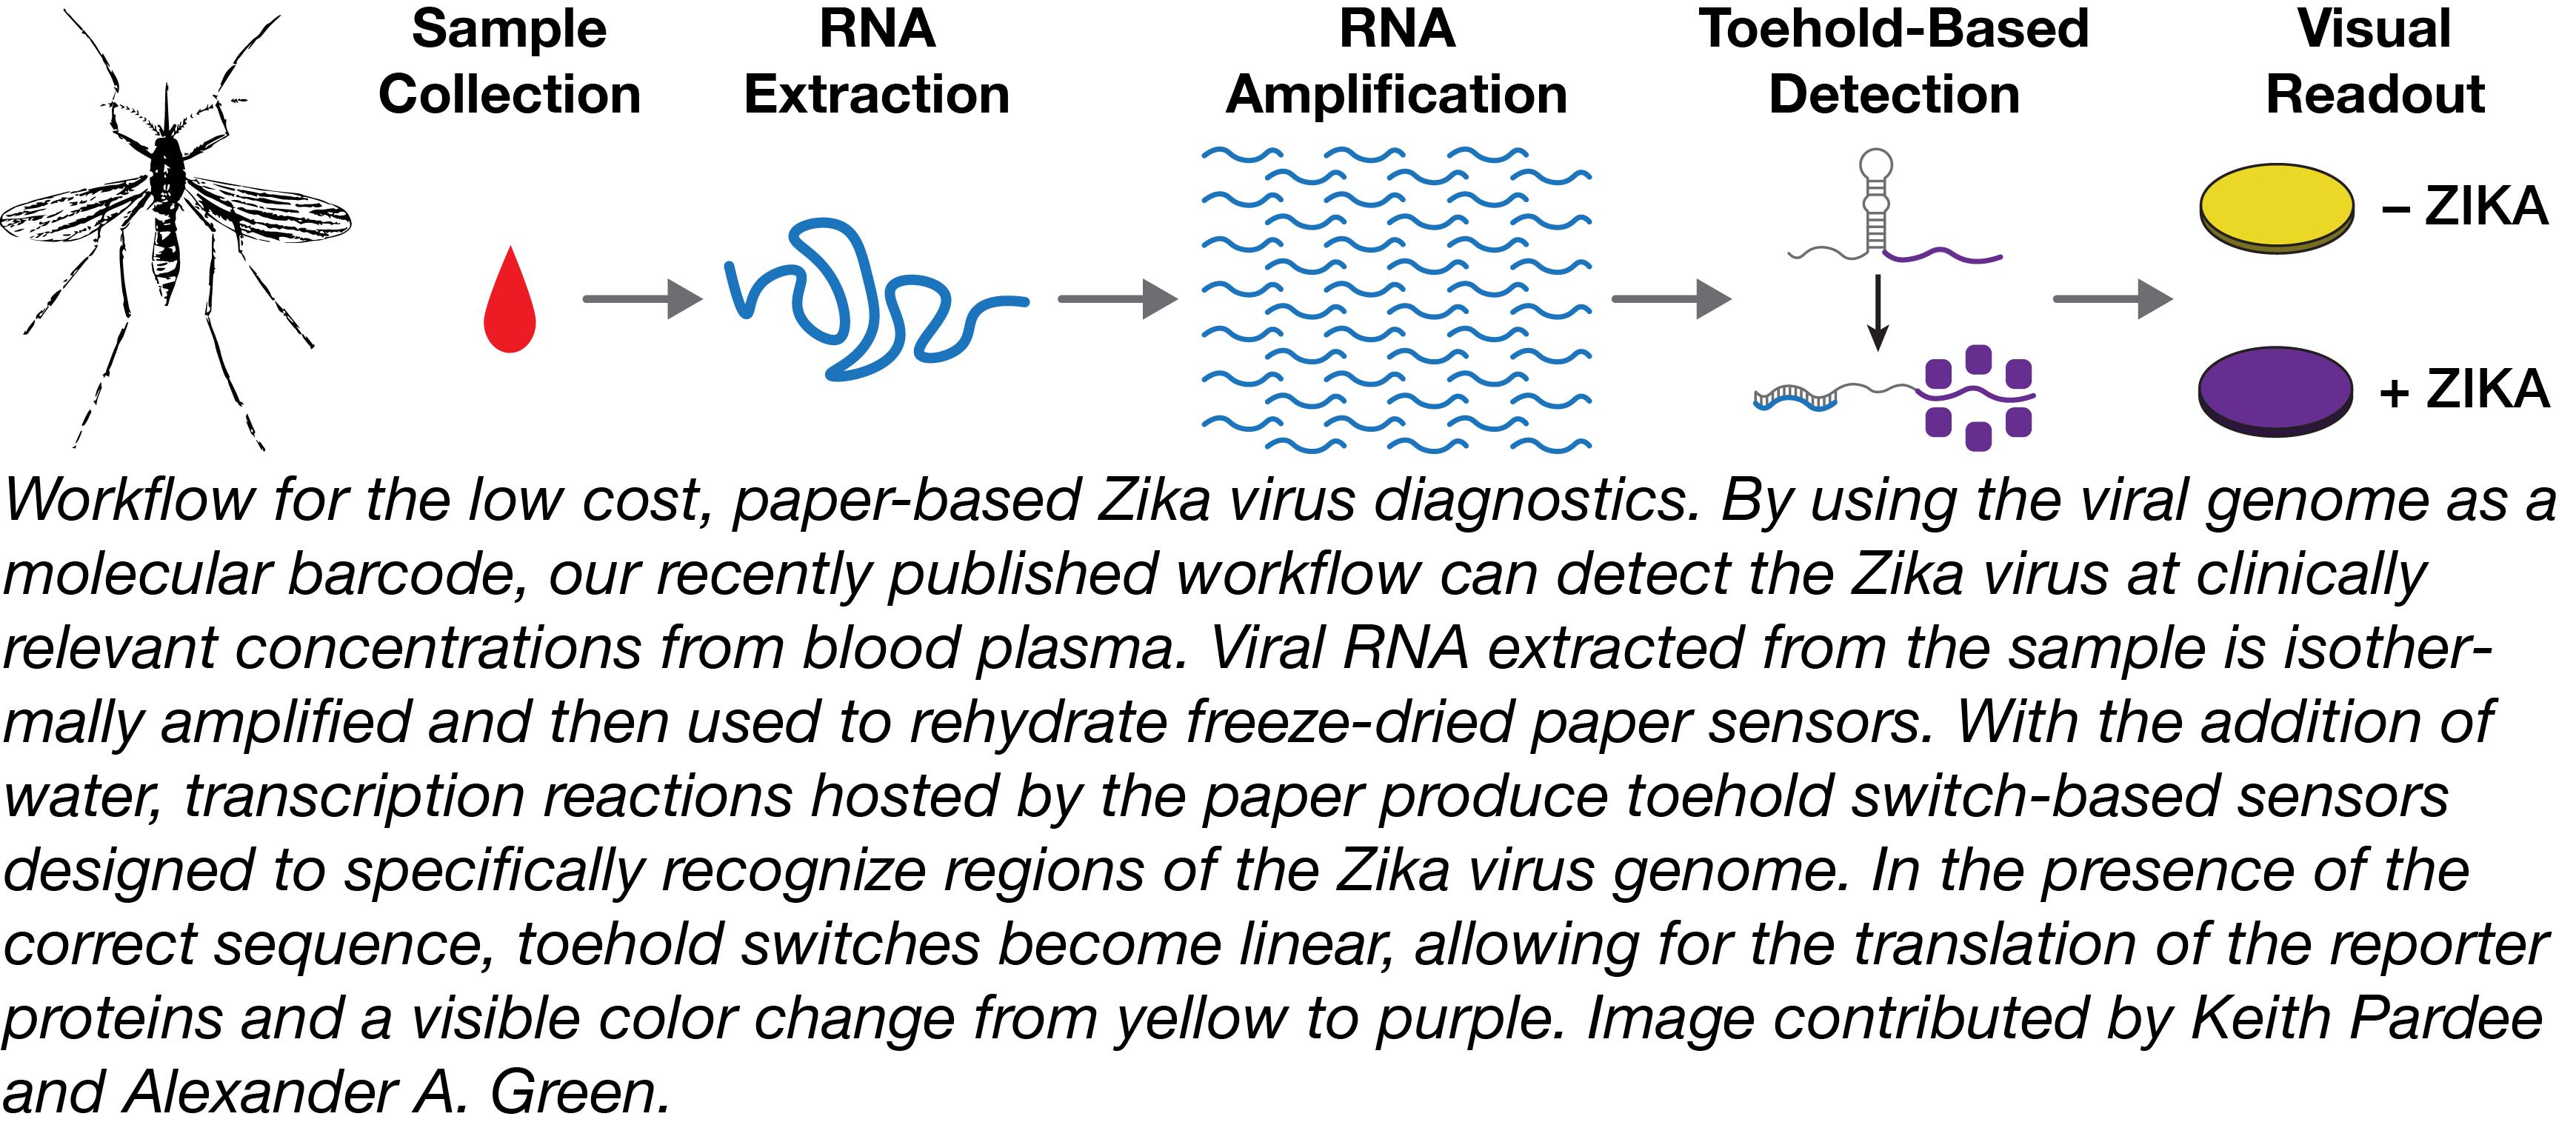 Zika detection workflow